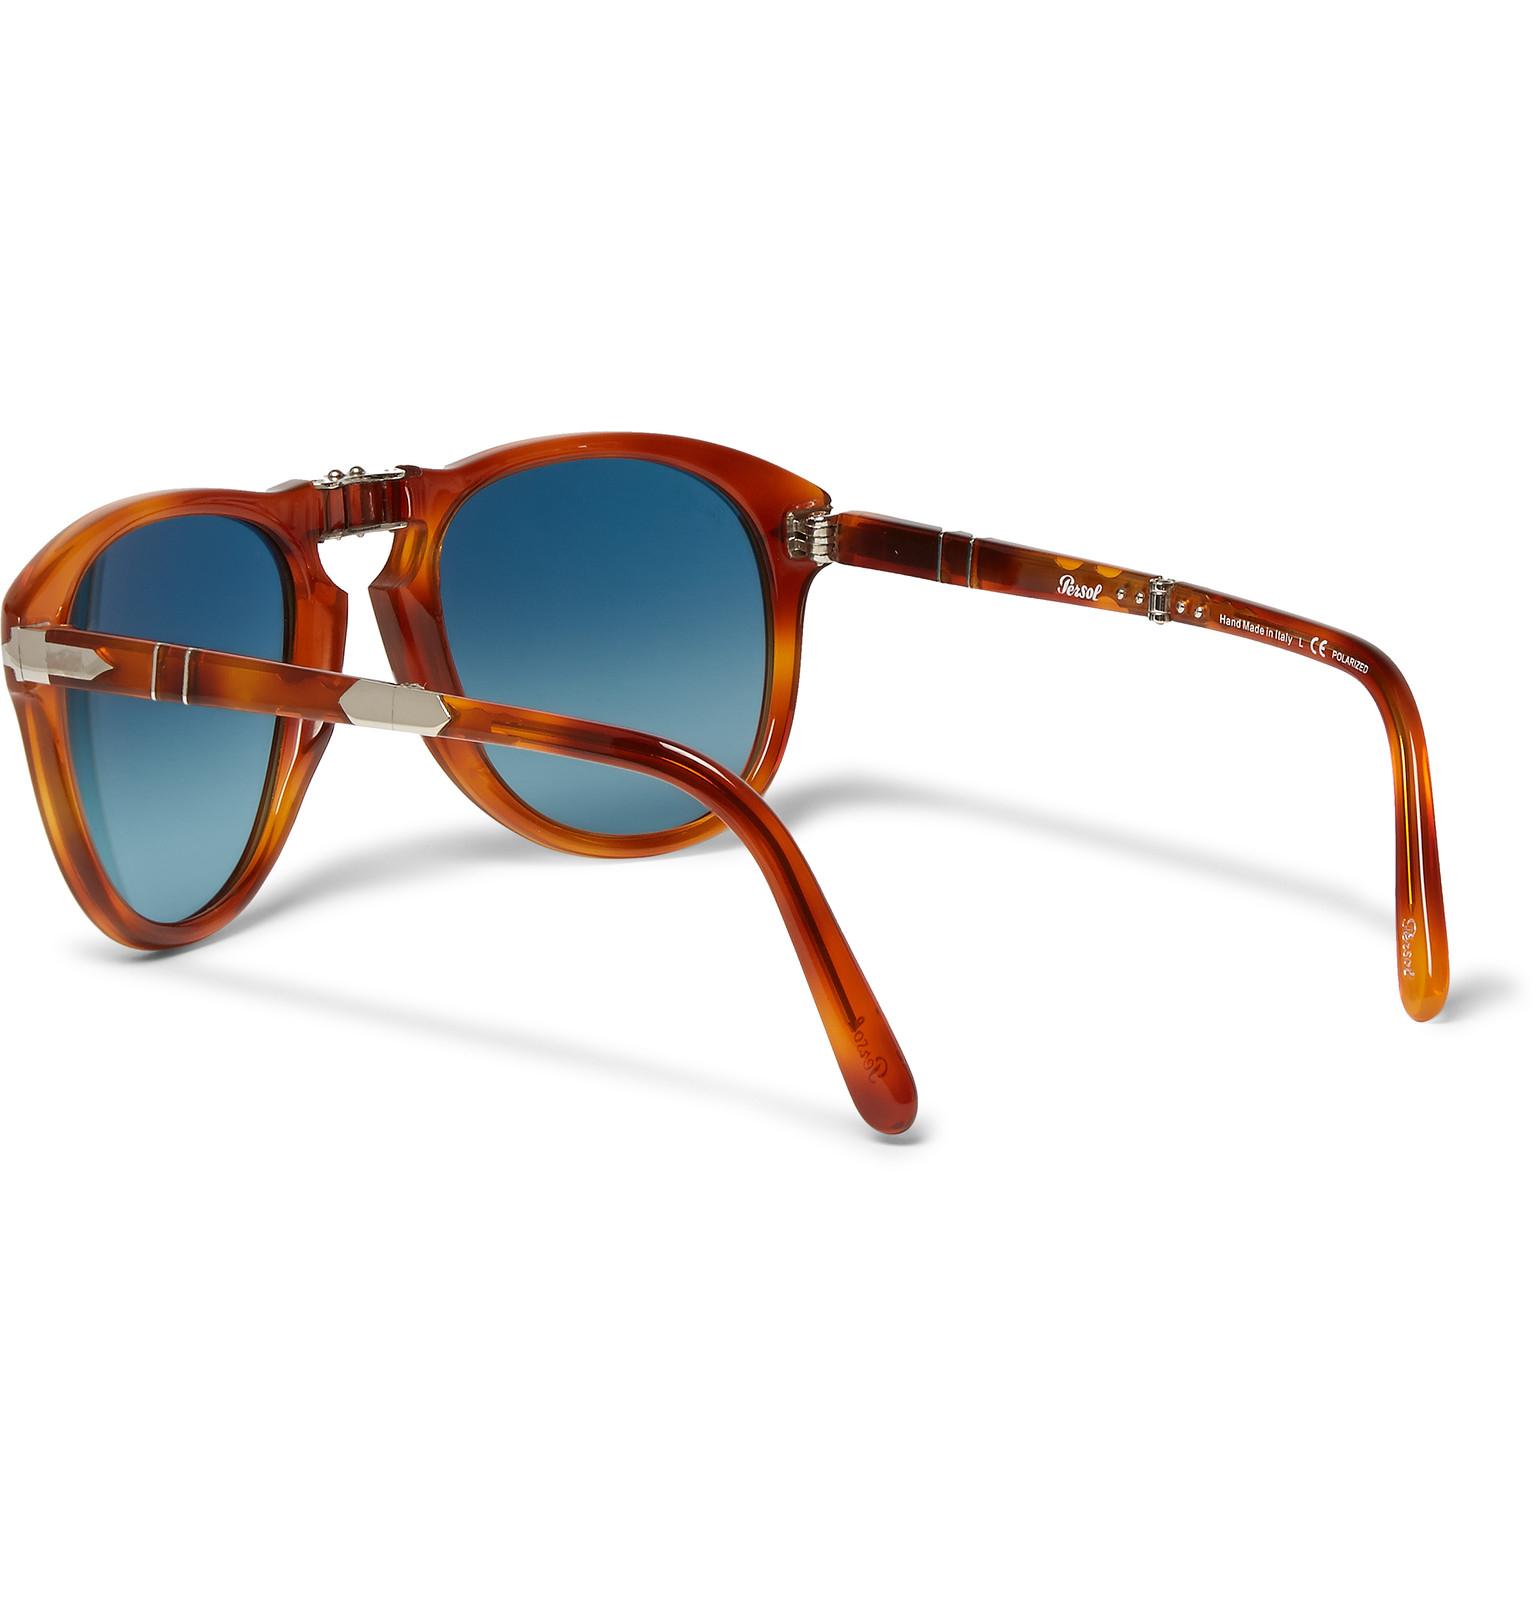 36007109227e Persol Steve Mcqueen Round-frame Folding Acetate Sunglasses in Brown ...